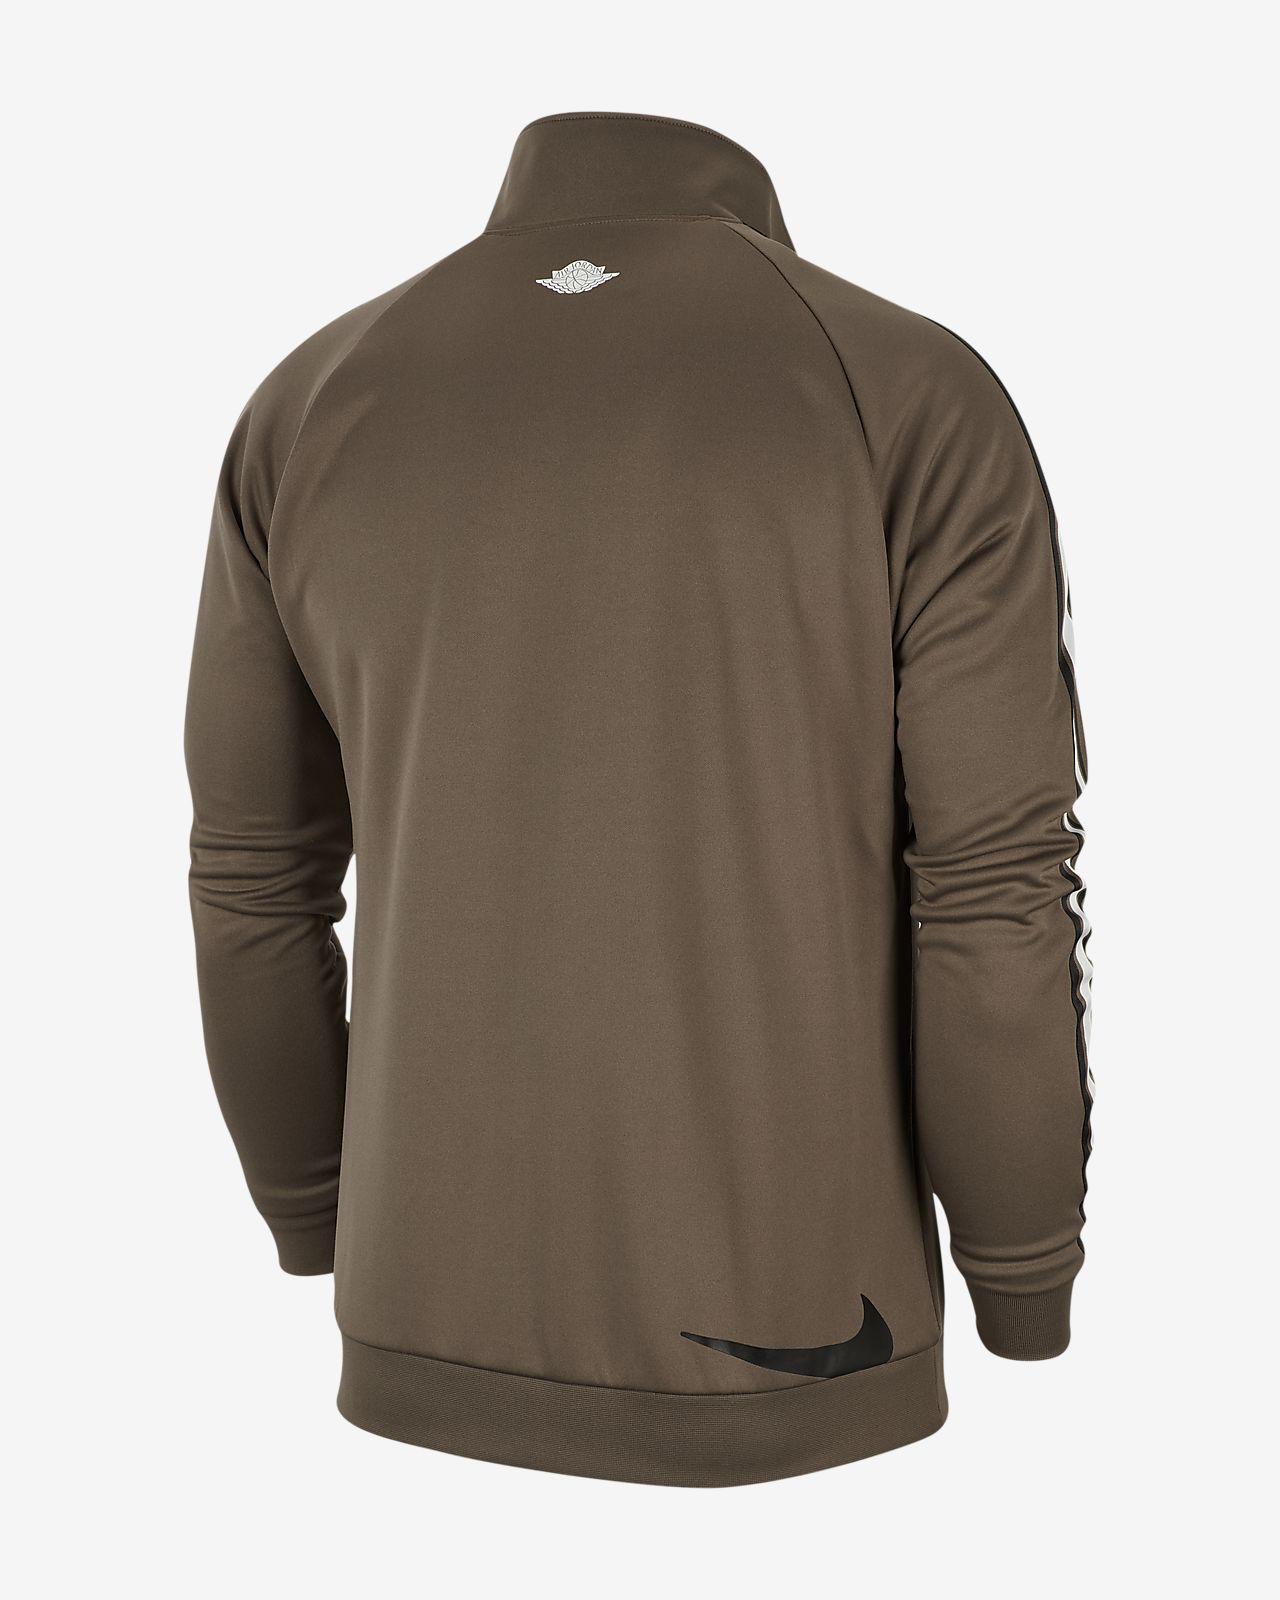 7323e10838eaa3 Jordan x Travis Scott Men s Track Jacket. Nike.com GB